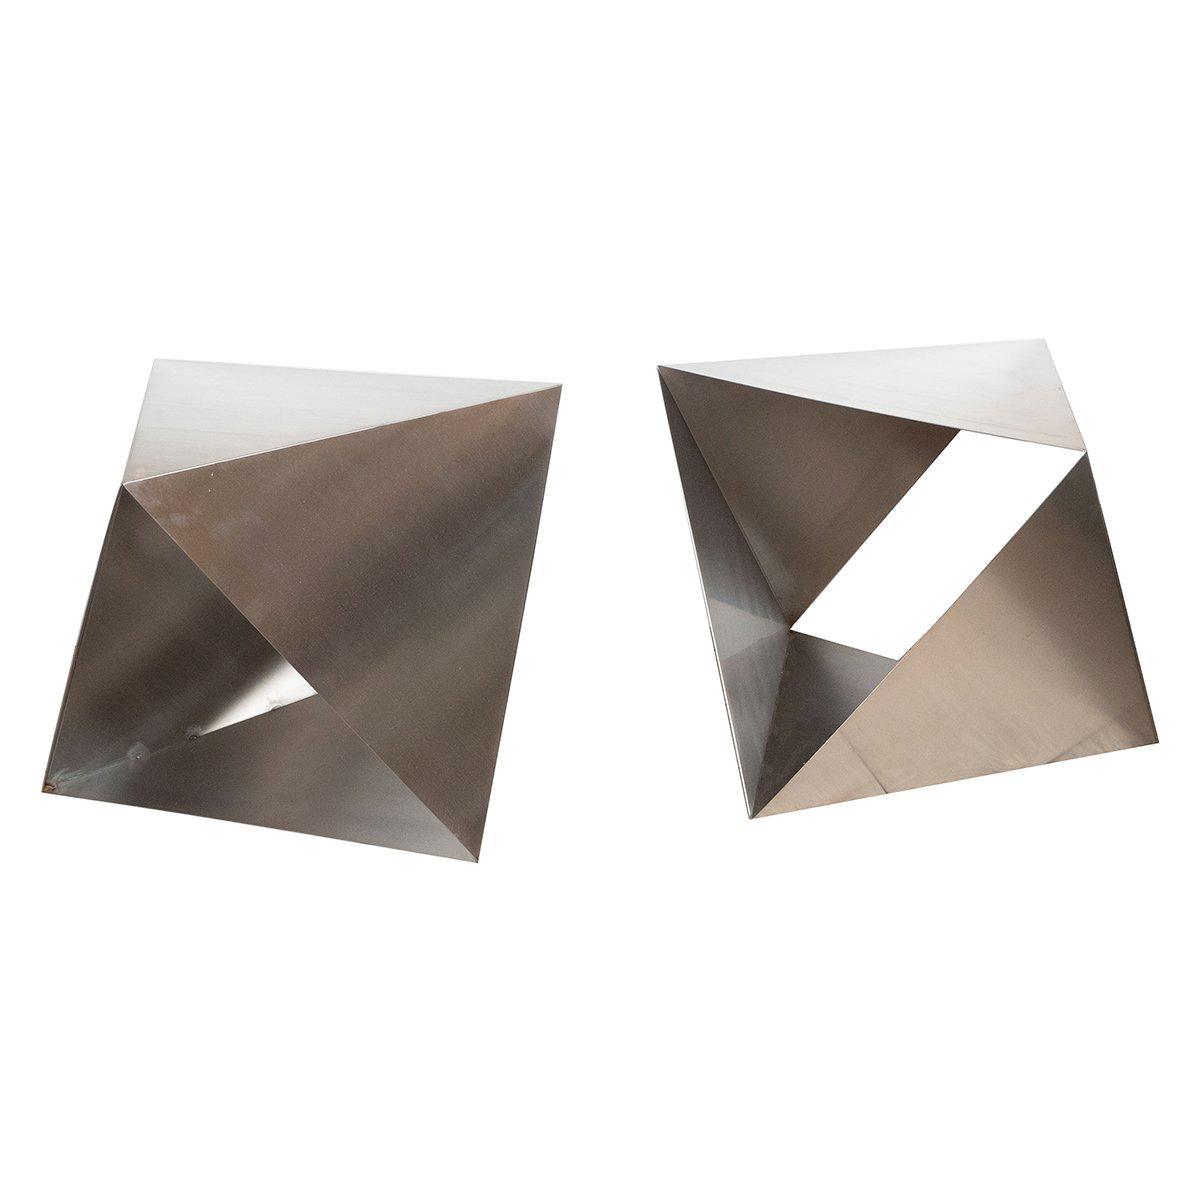 Modular Polyhedron Side Tables